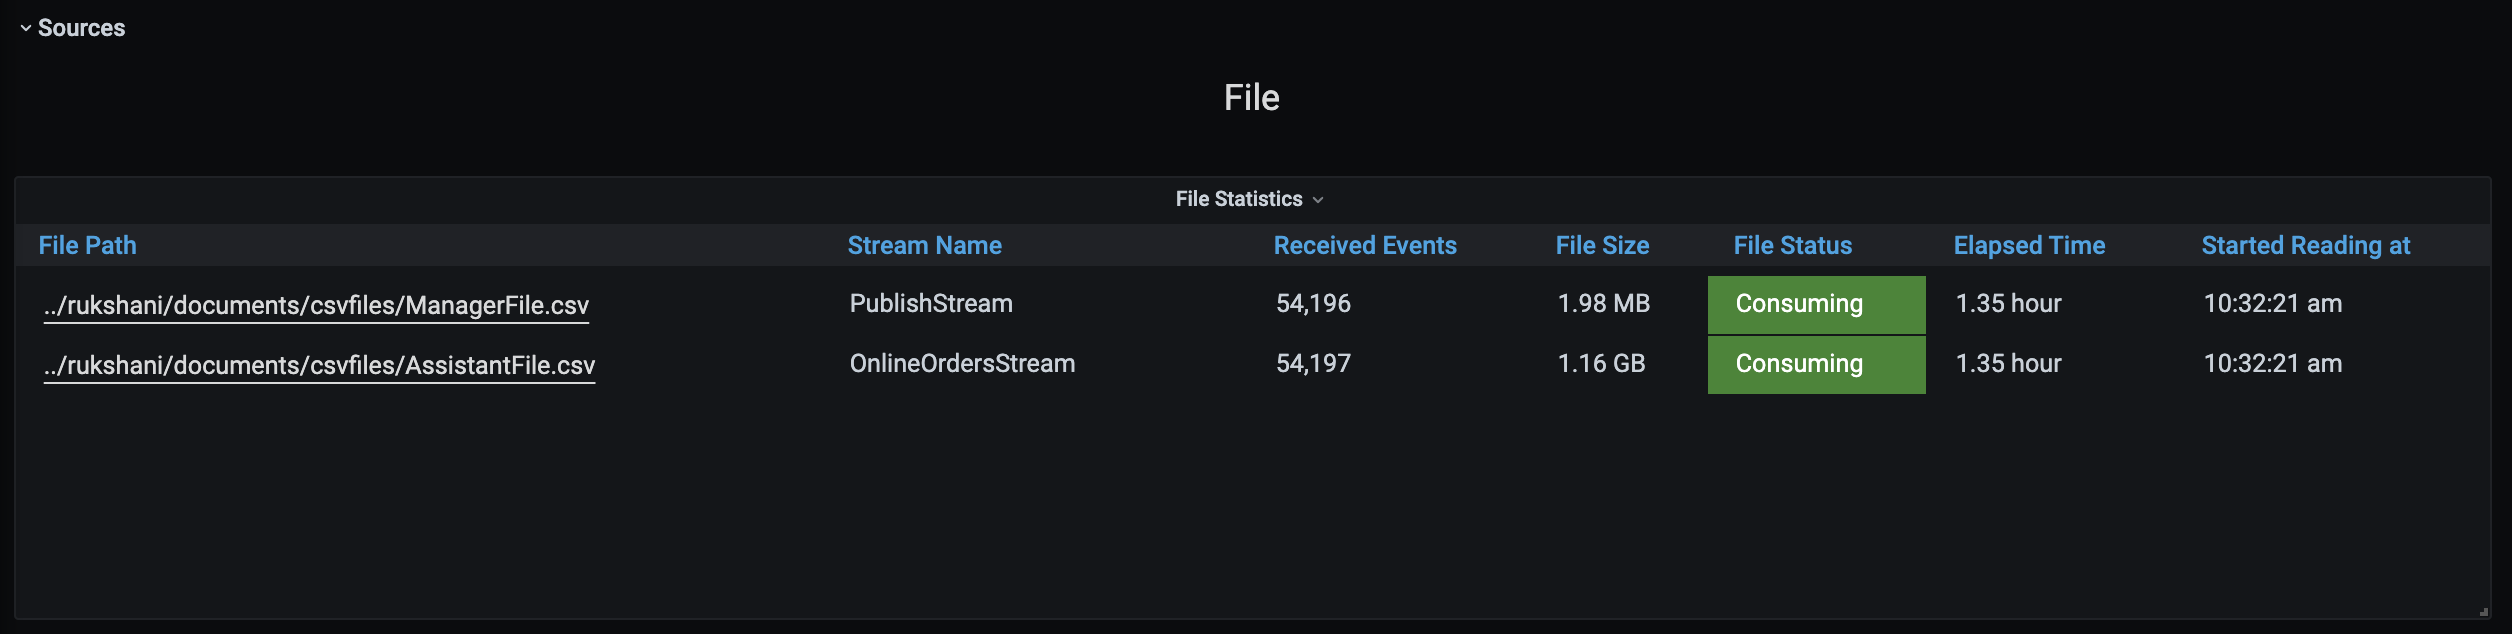 File Source Statistics